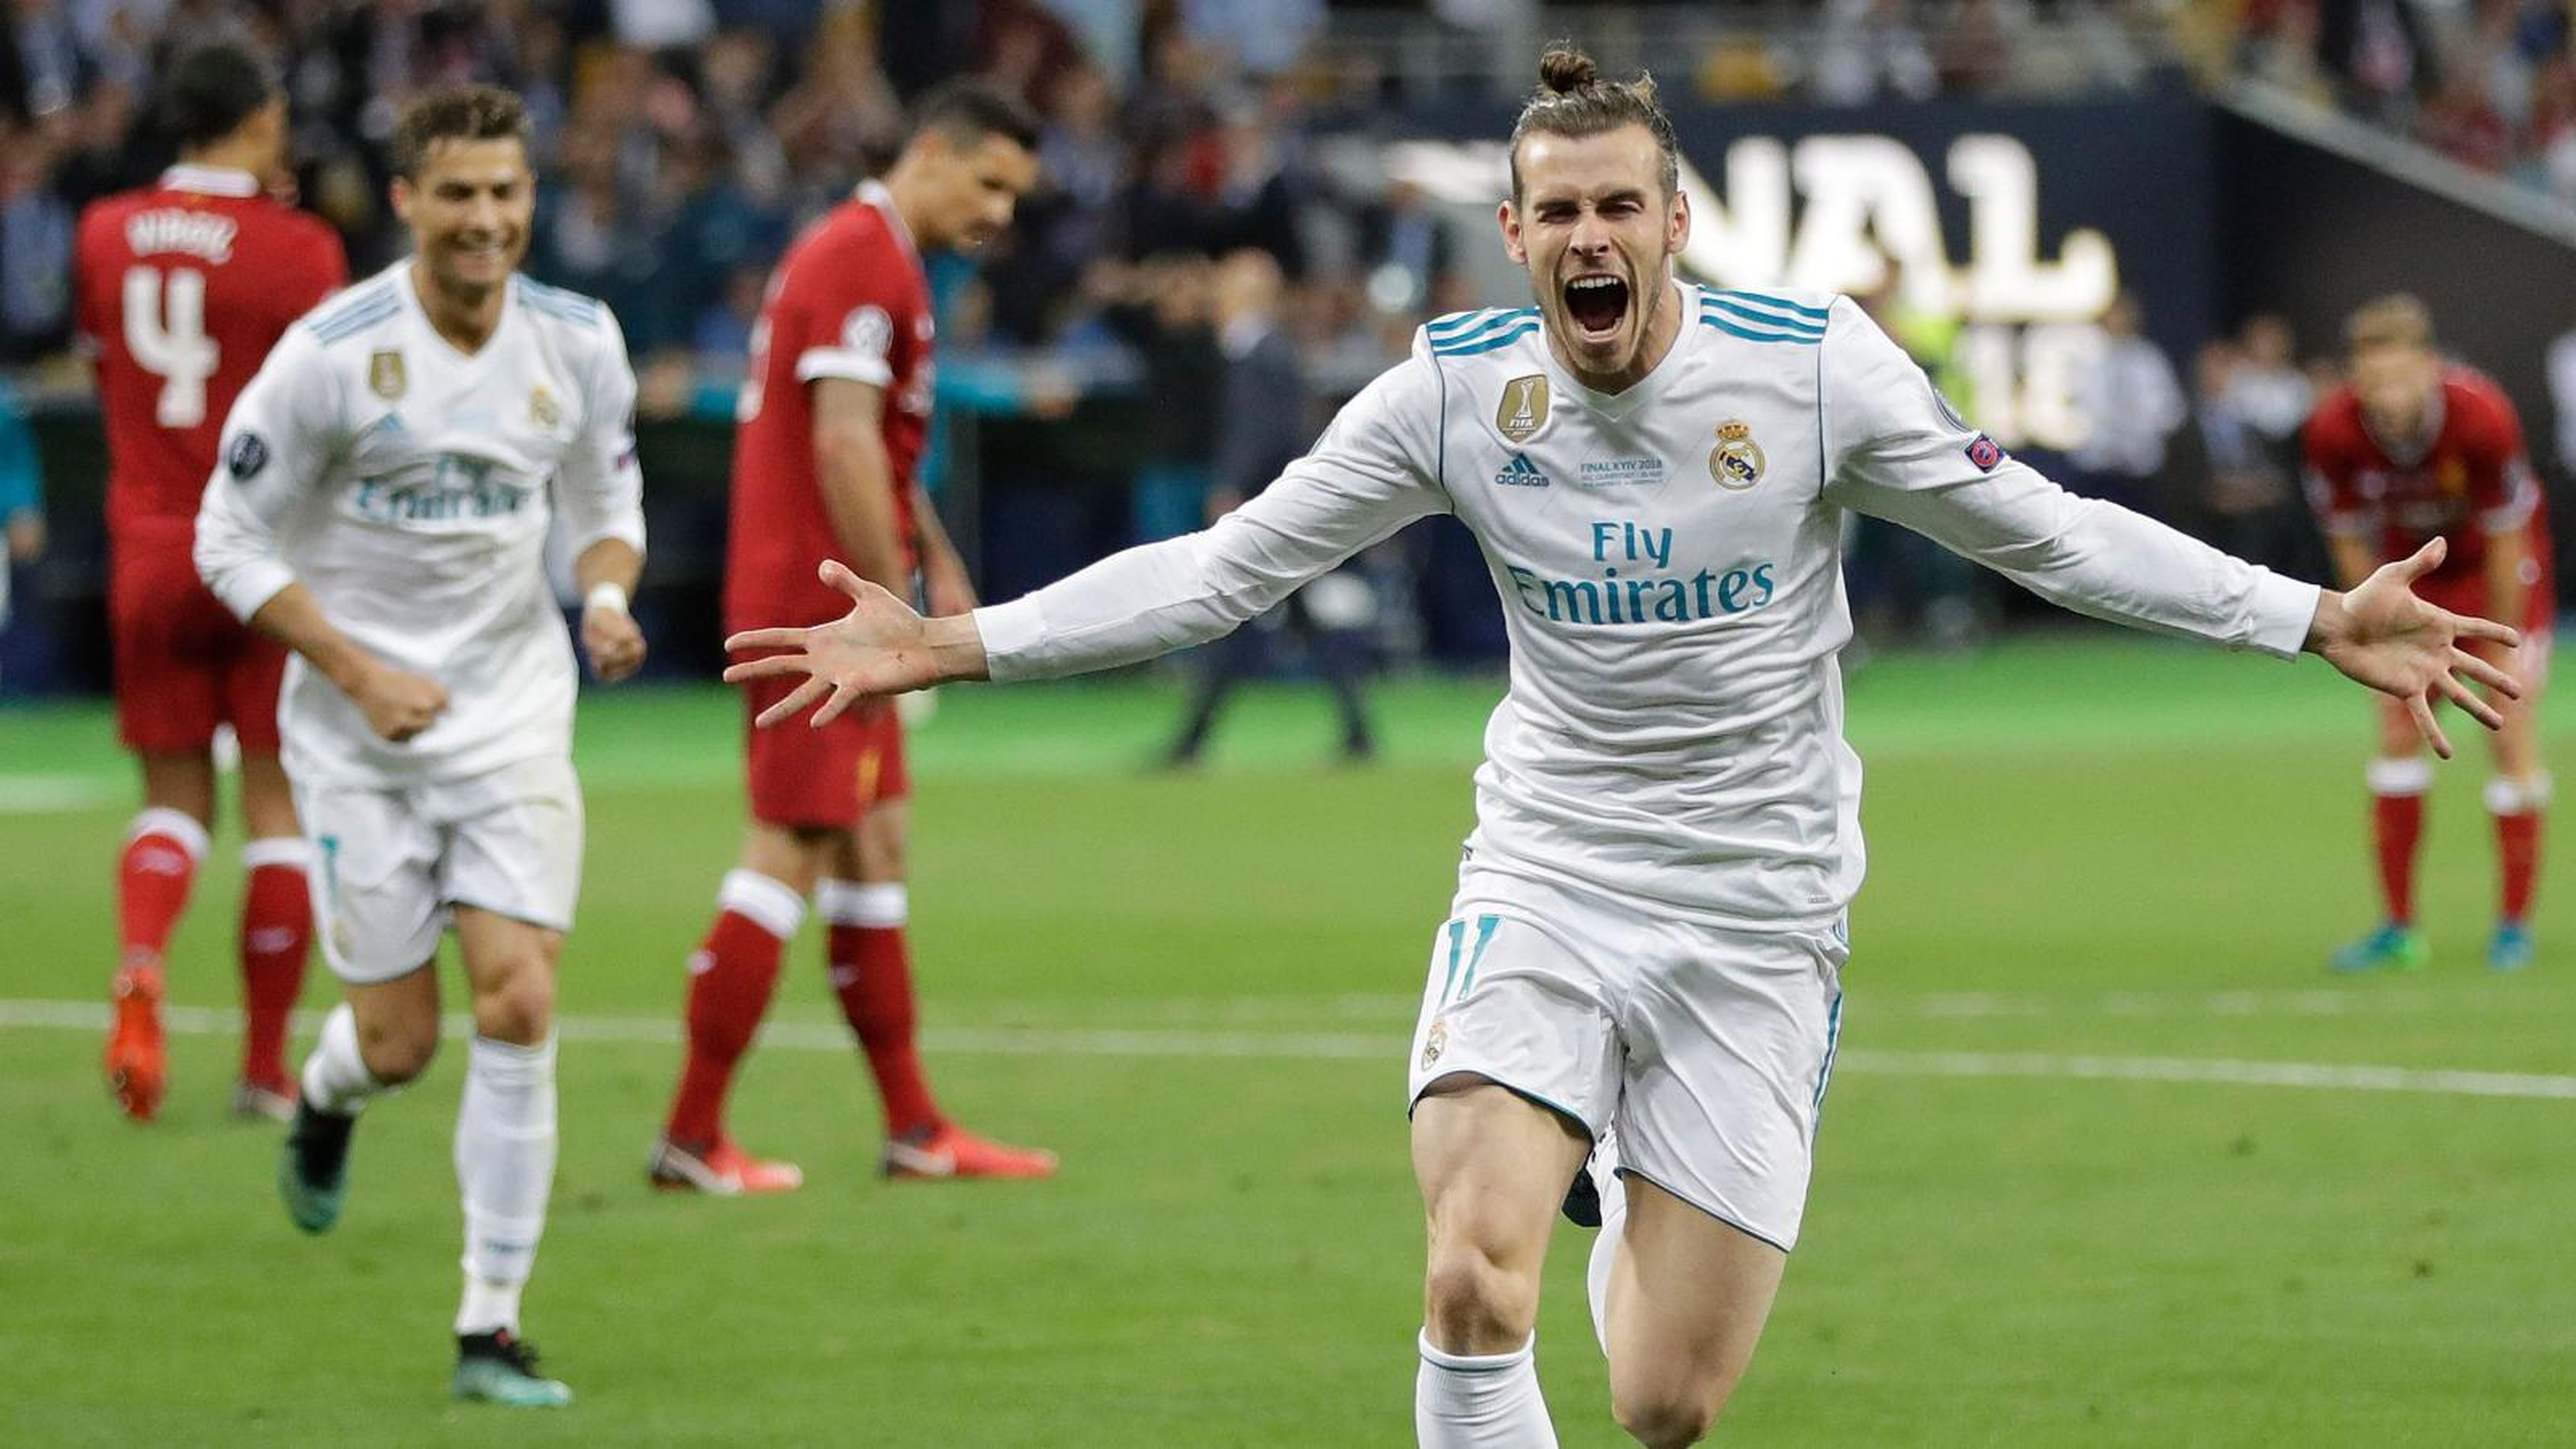 Watch Gareth Bale's Champions League final goal — Quartz